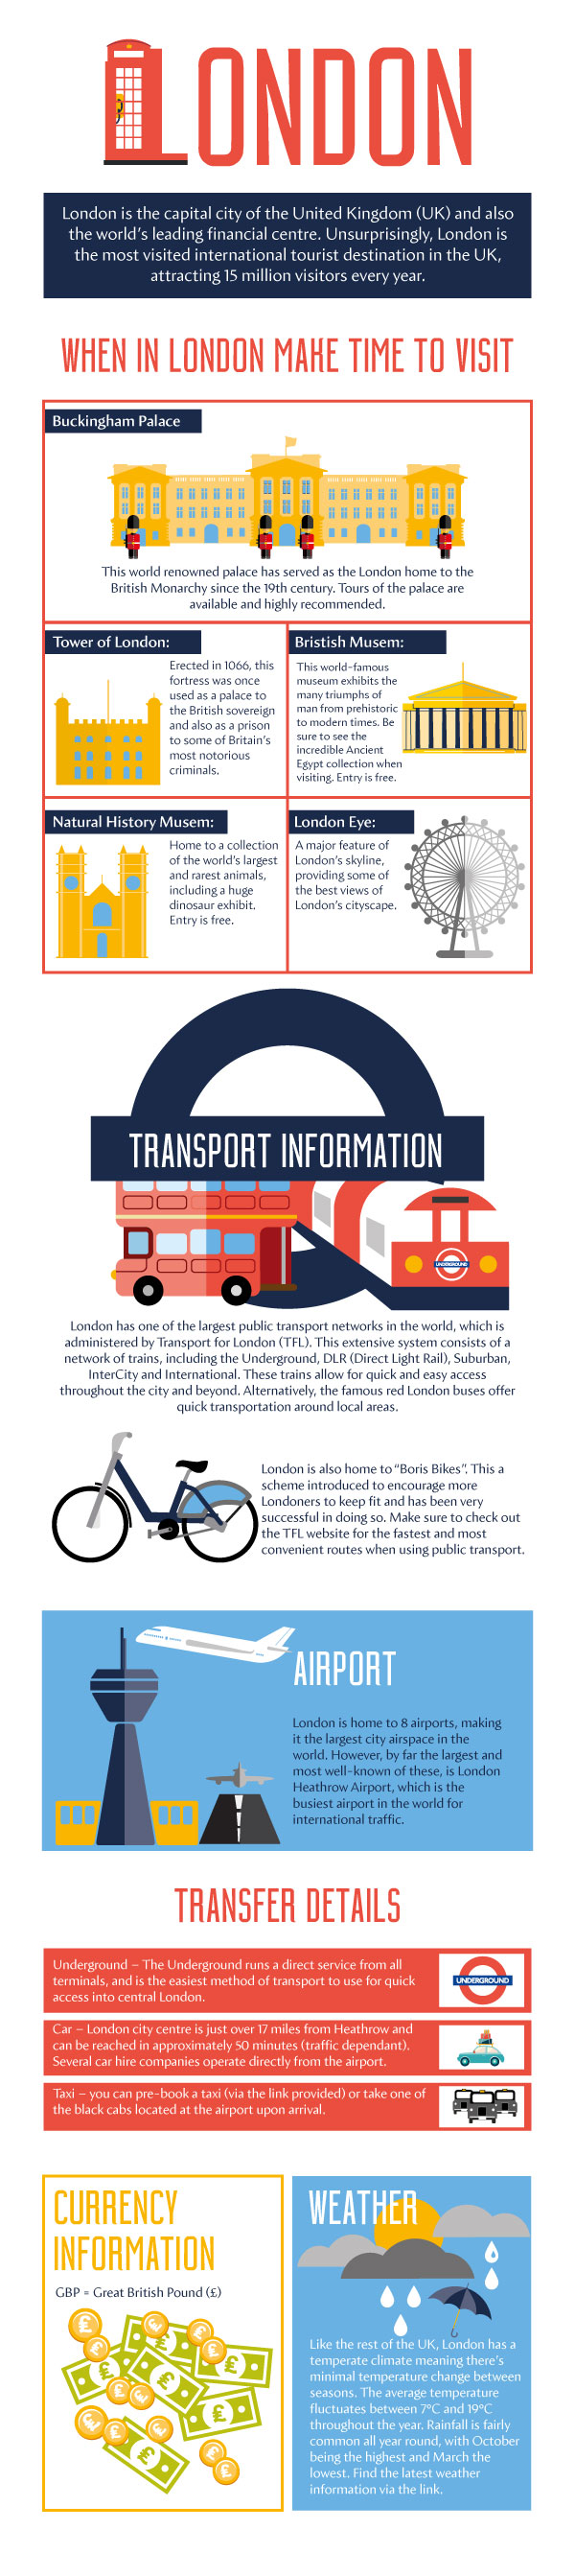 SilverDoor-London-city-guide54e8b587c91b8.jpg?ooMediaId=561